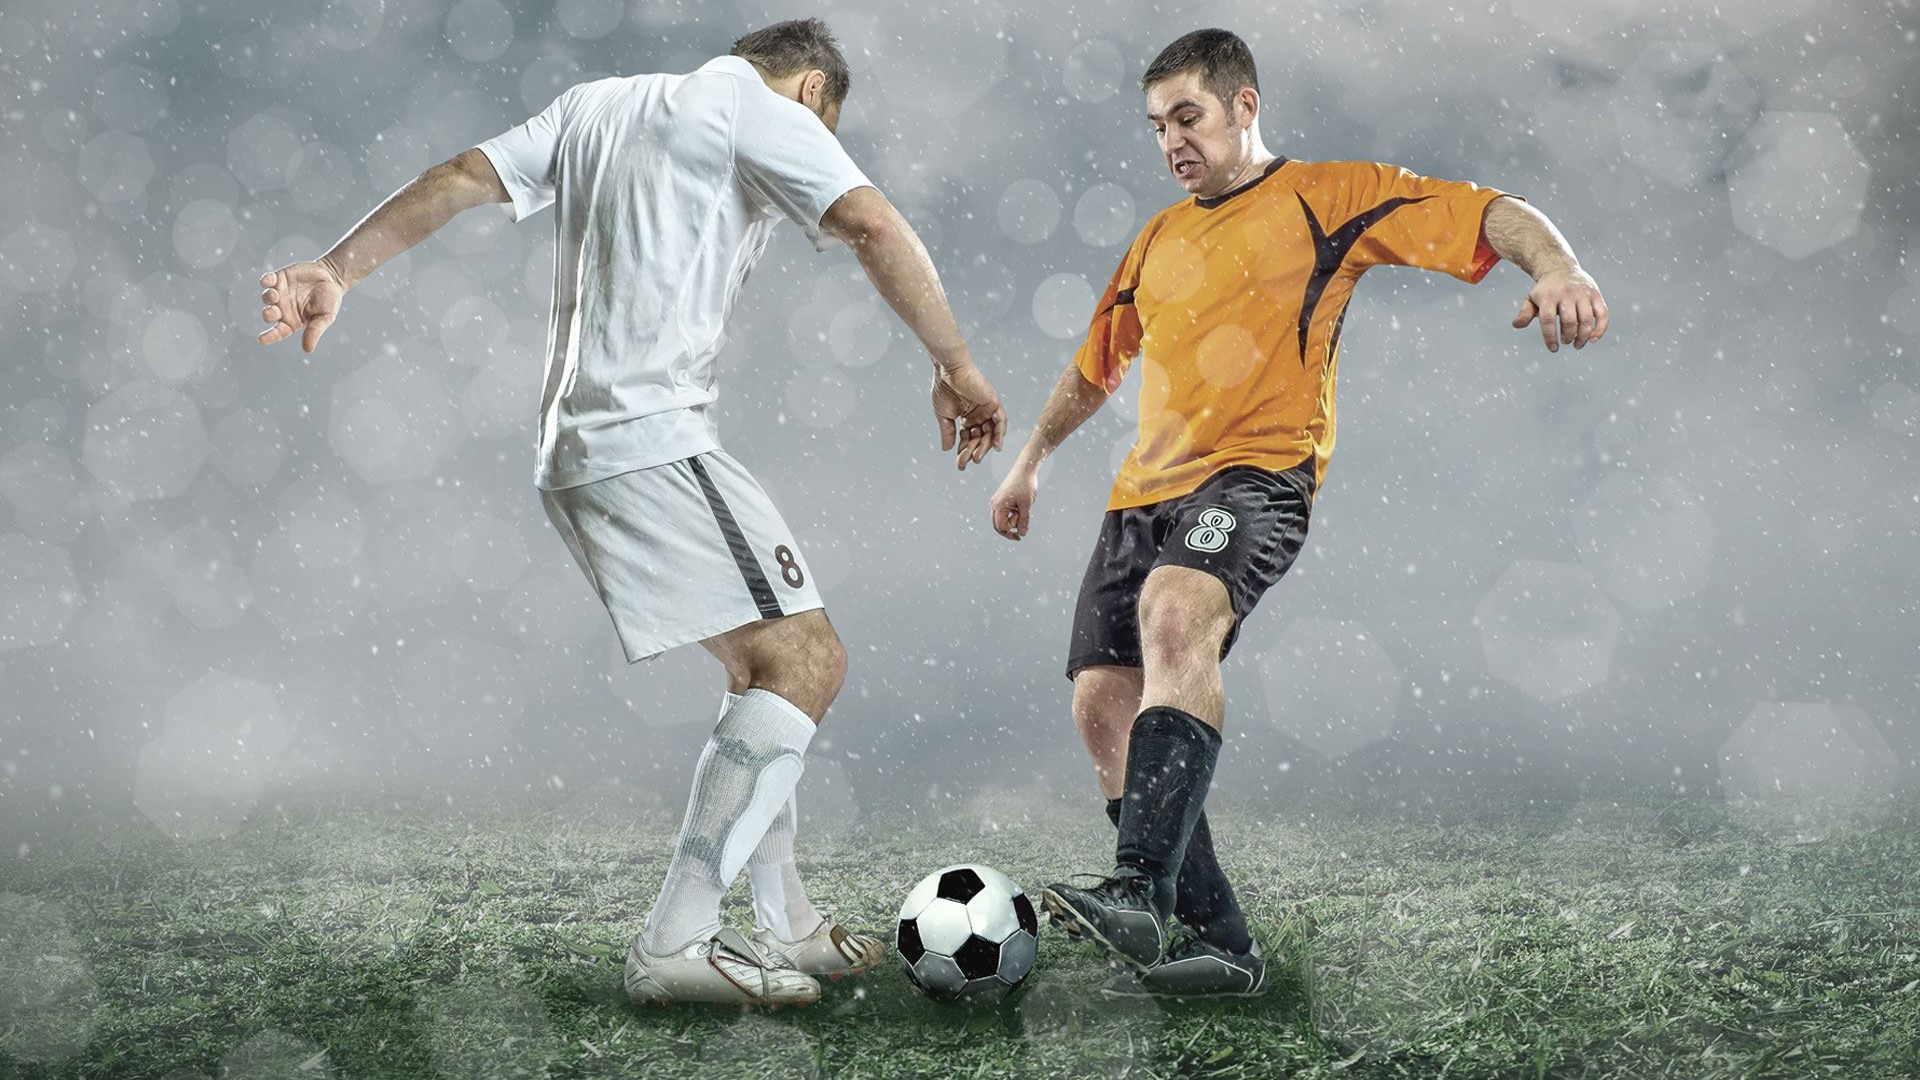 stade-toulousain-vs-lyon-rugby-live